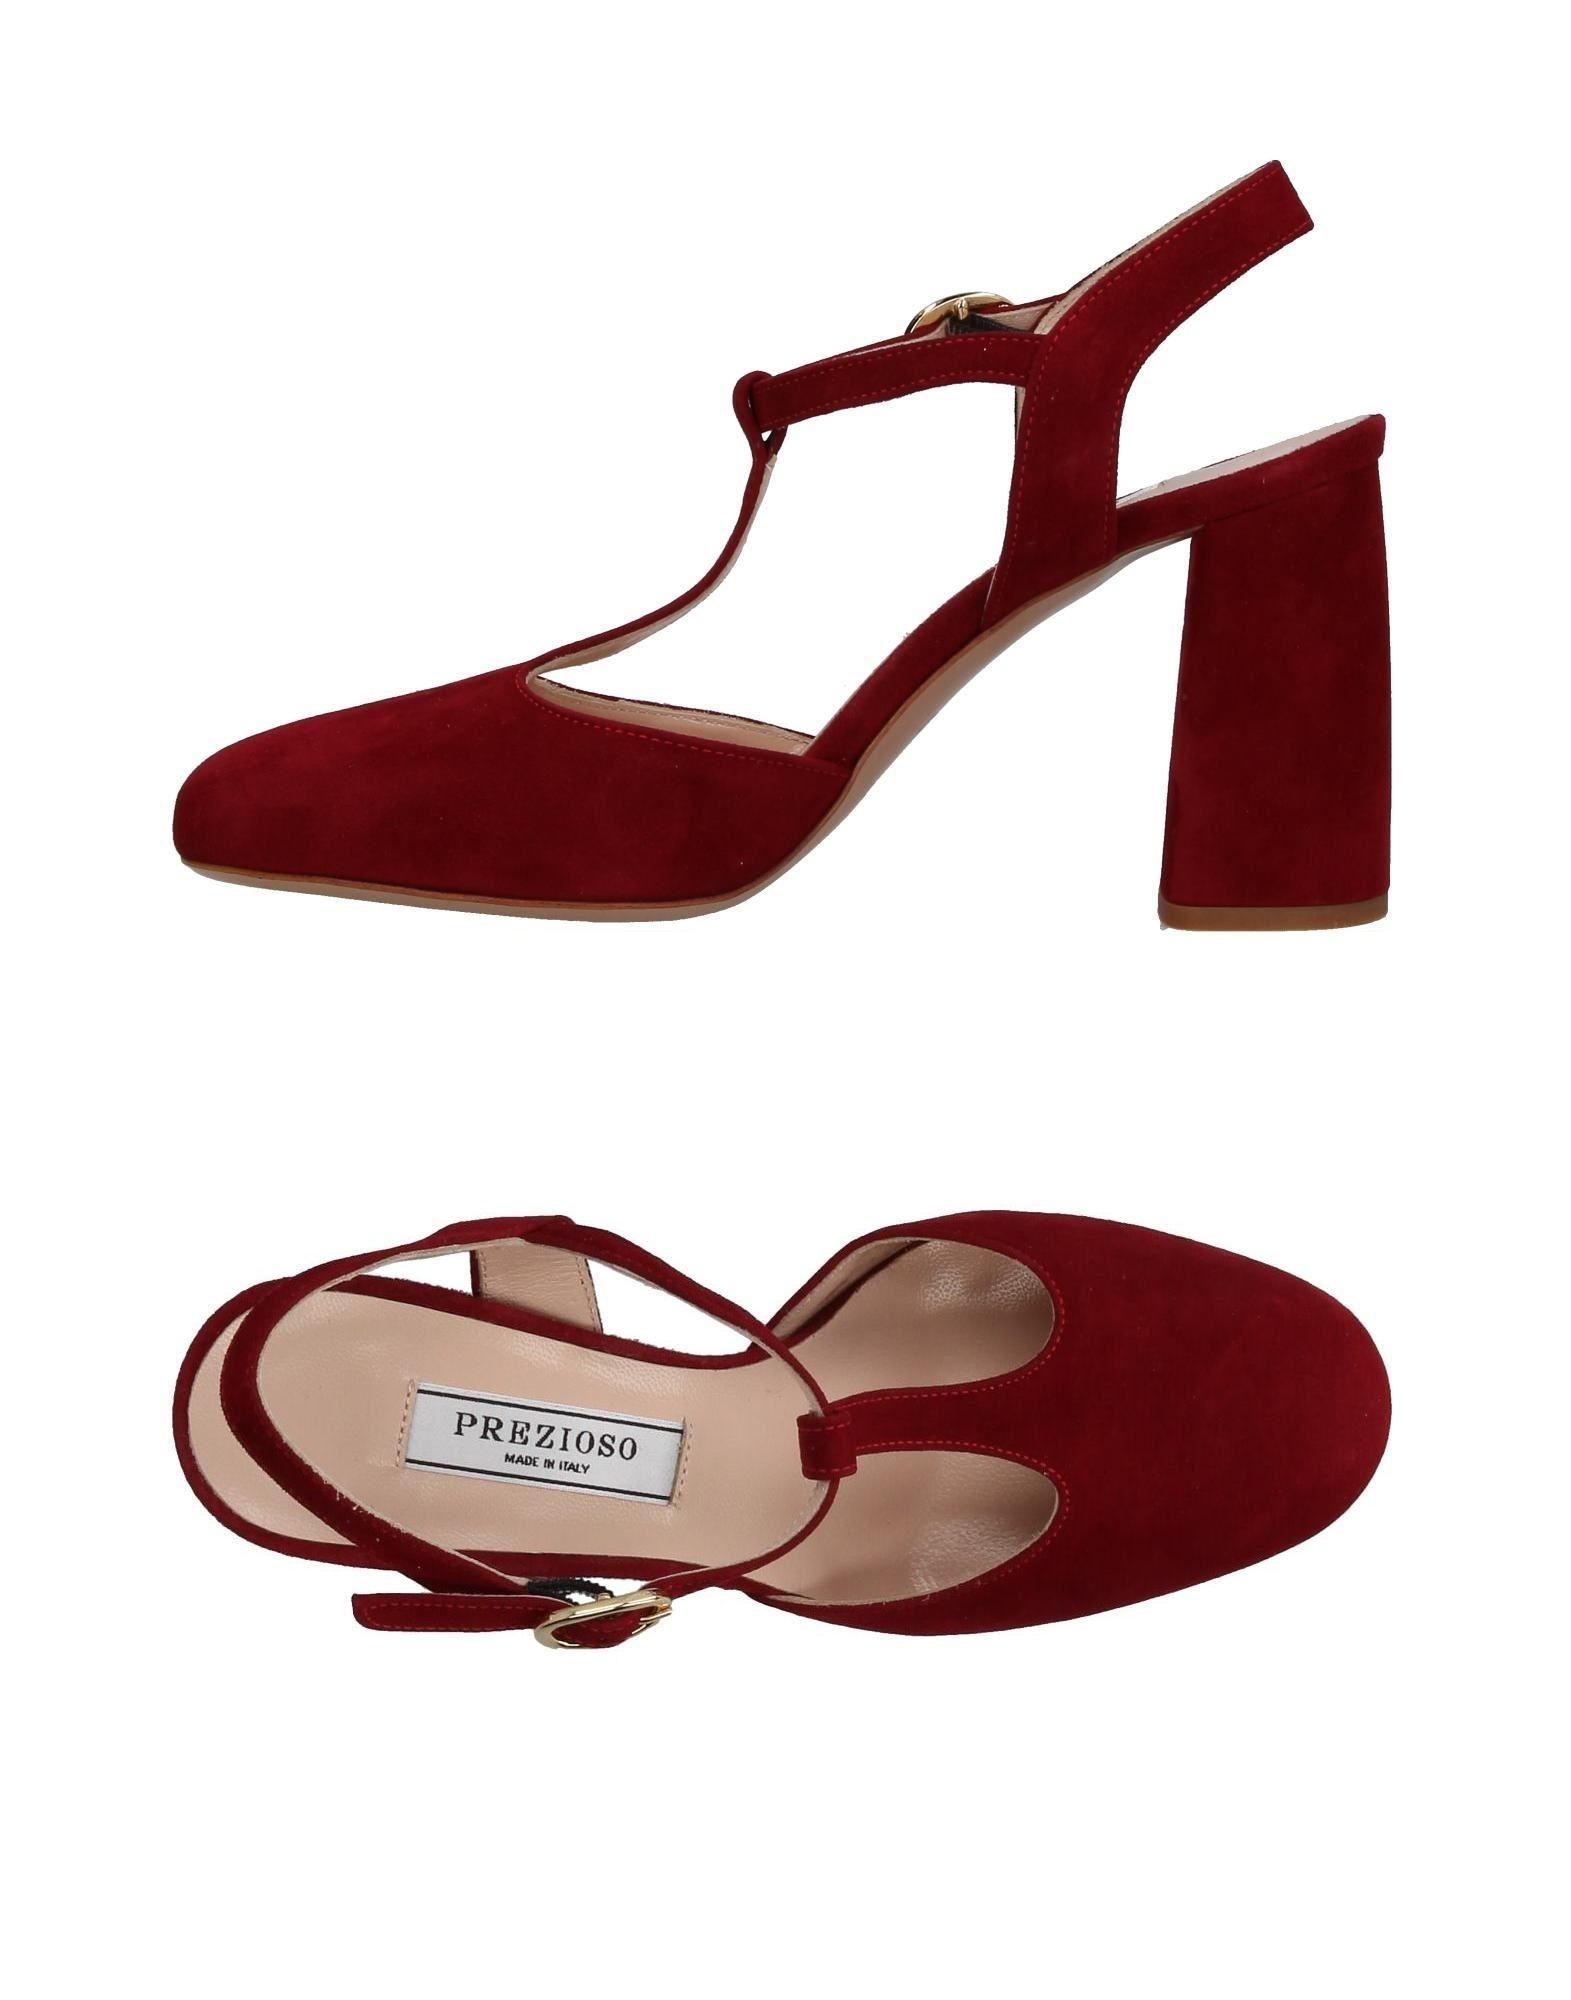 Prezioso Pumps Damen  11414626UQ Gute Qualität beliebte Schuhe